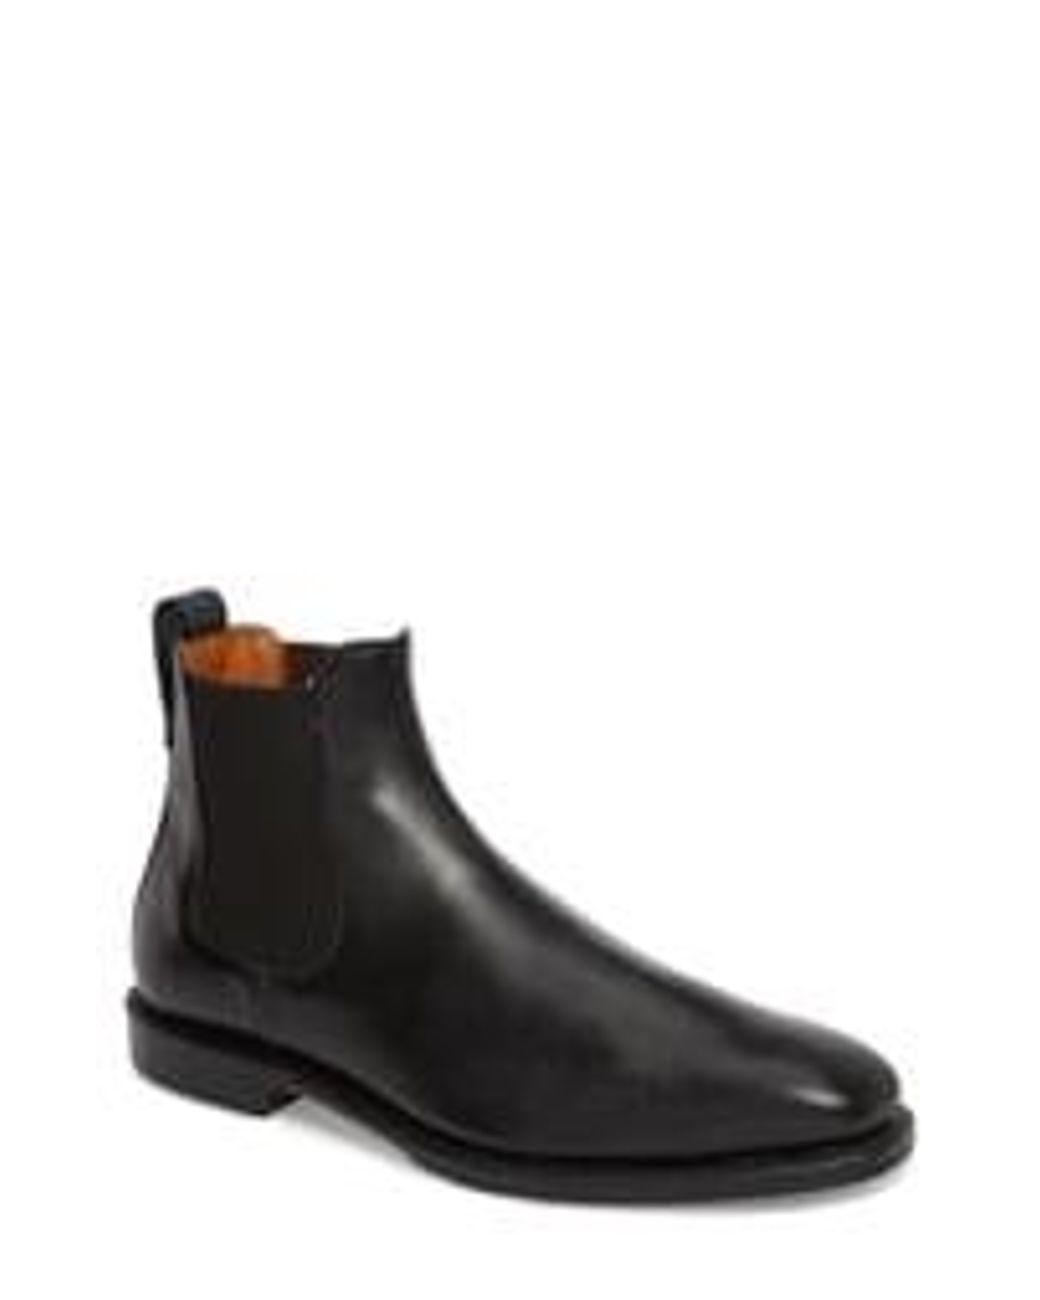 Allen Edmonds Leather Men S Liverpool Boot In Black Leather Brown For Men Lyst